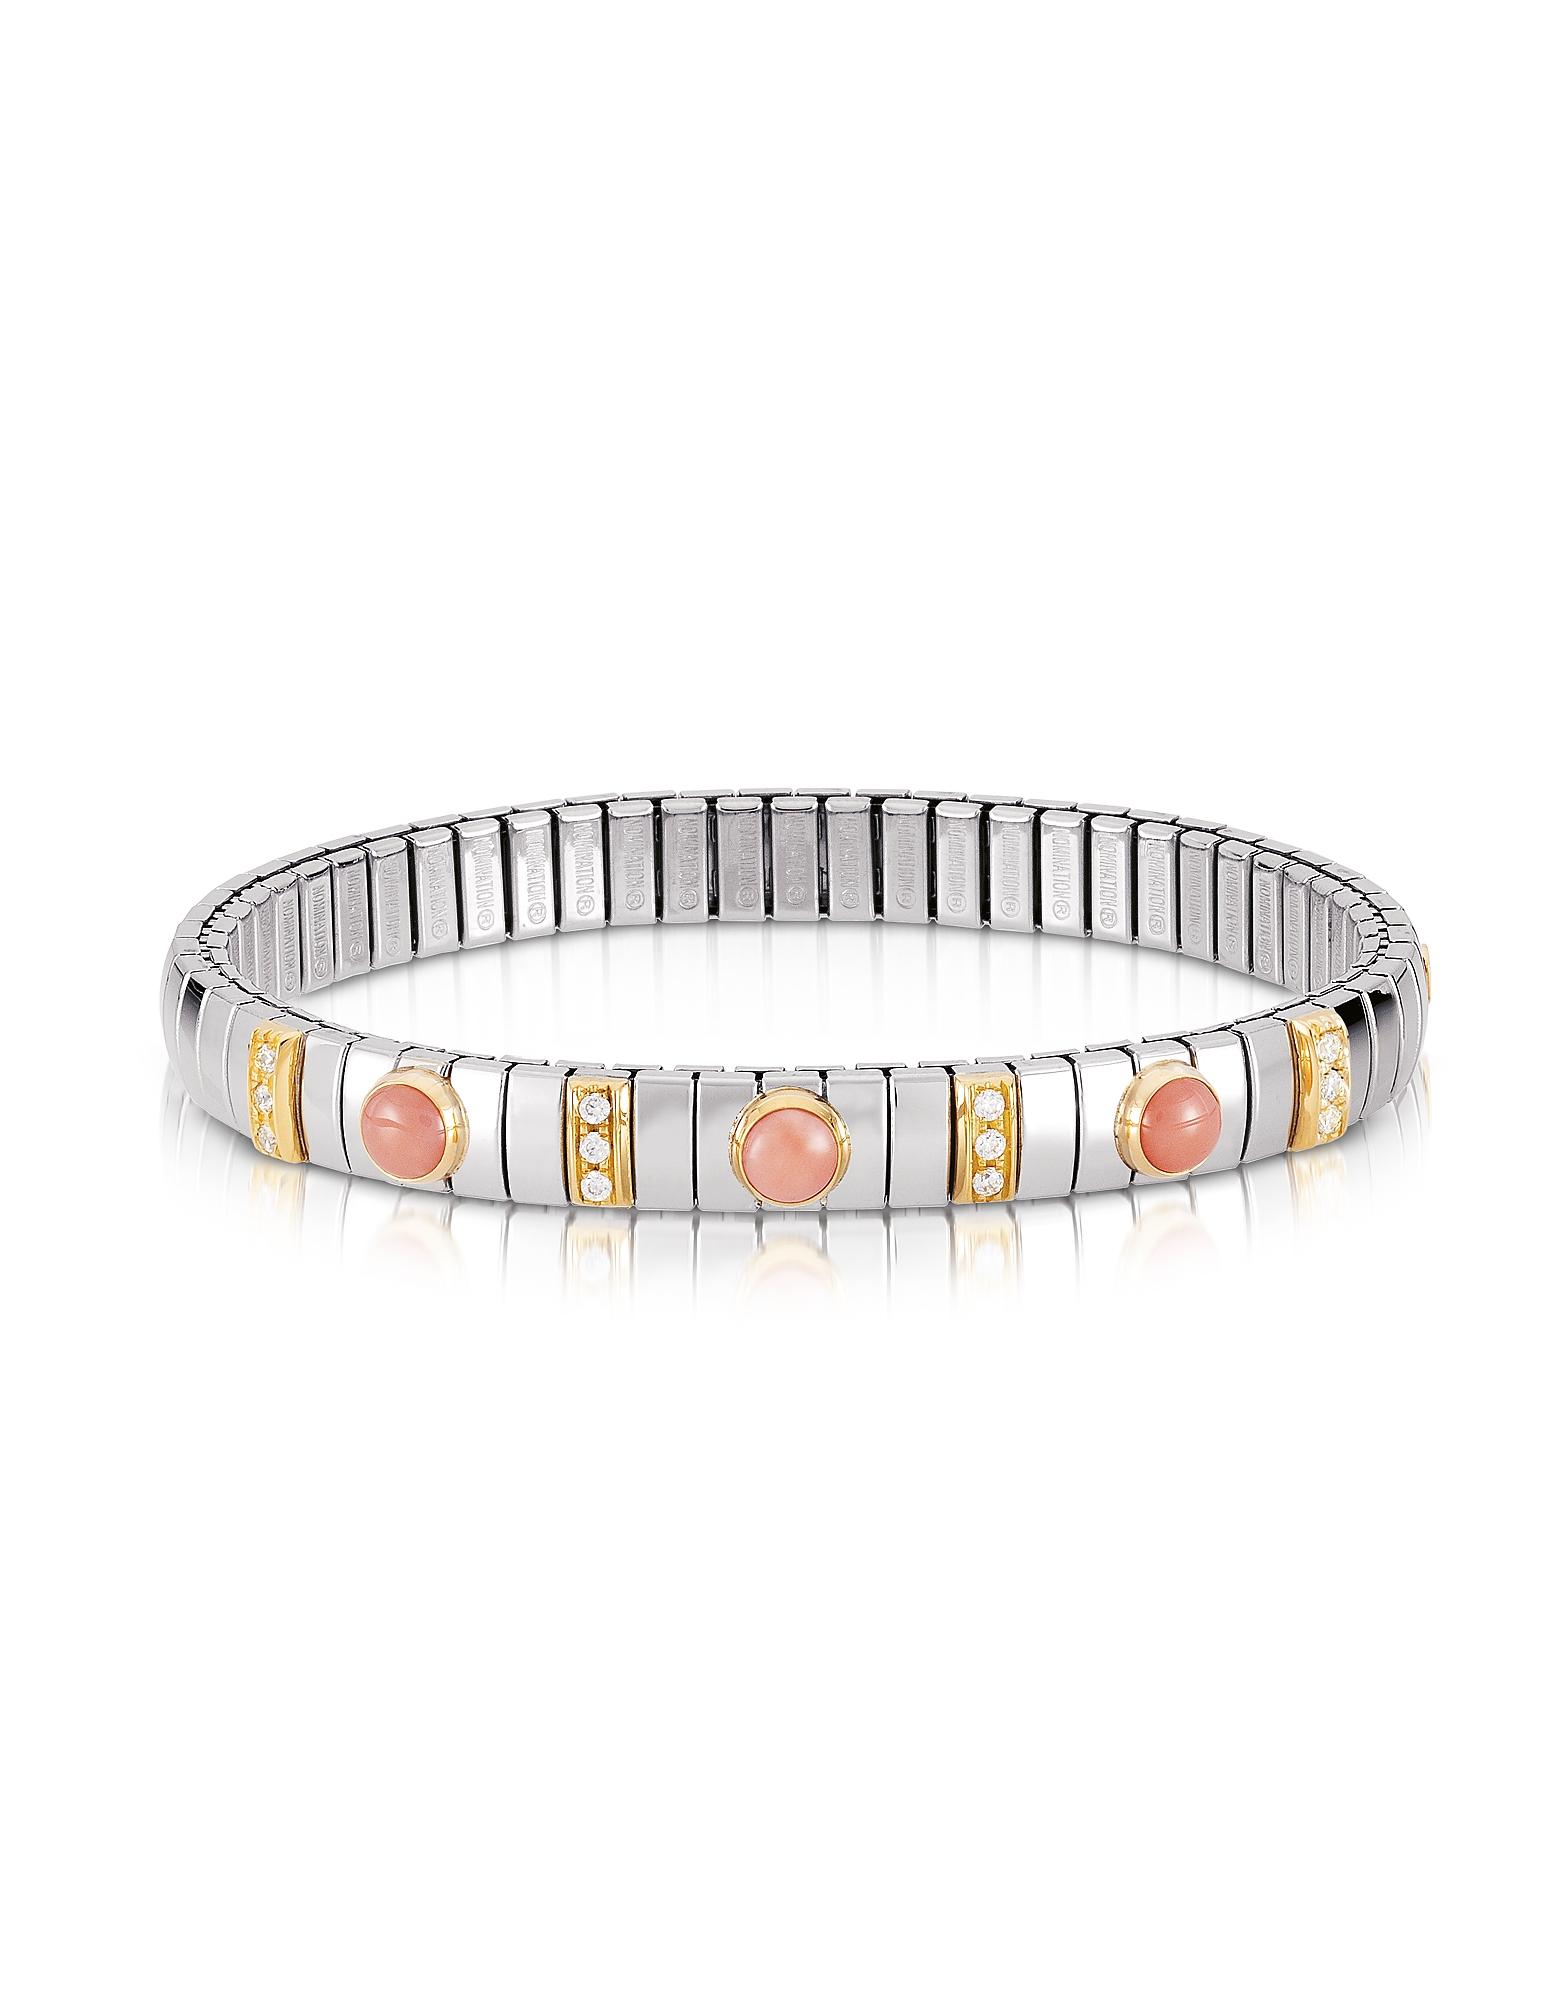 Nomination Bracelets, Golden Stainless Steel Women's Bracelet w/Pink Corals and Cubic Zirconia